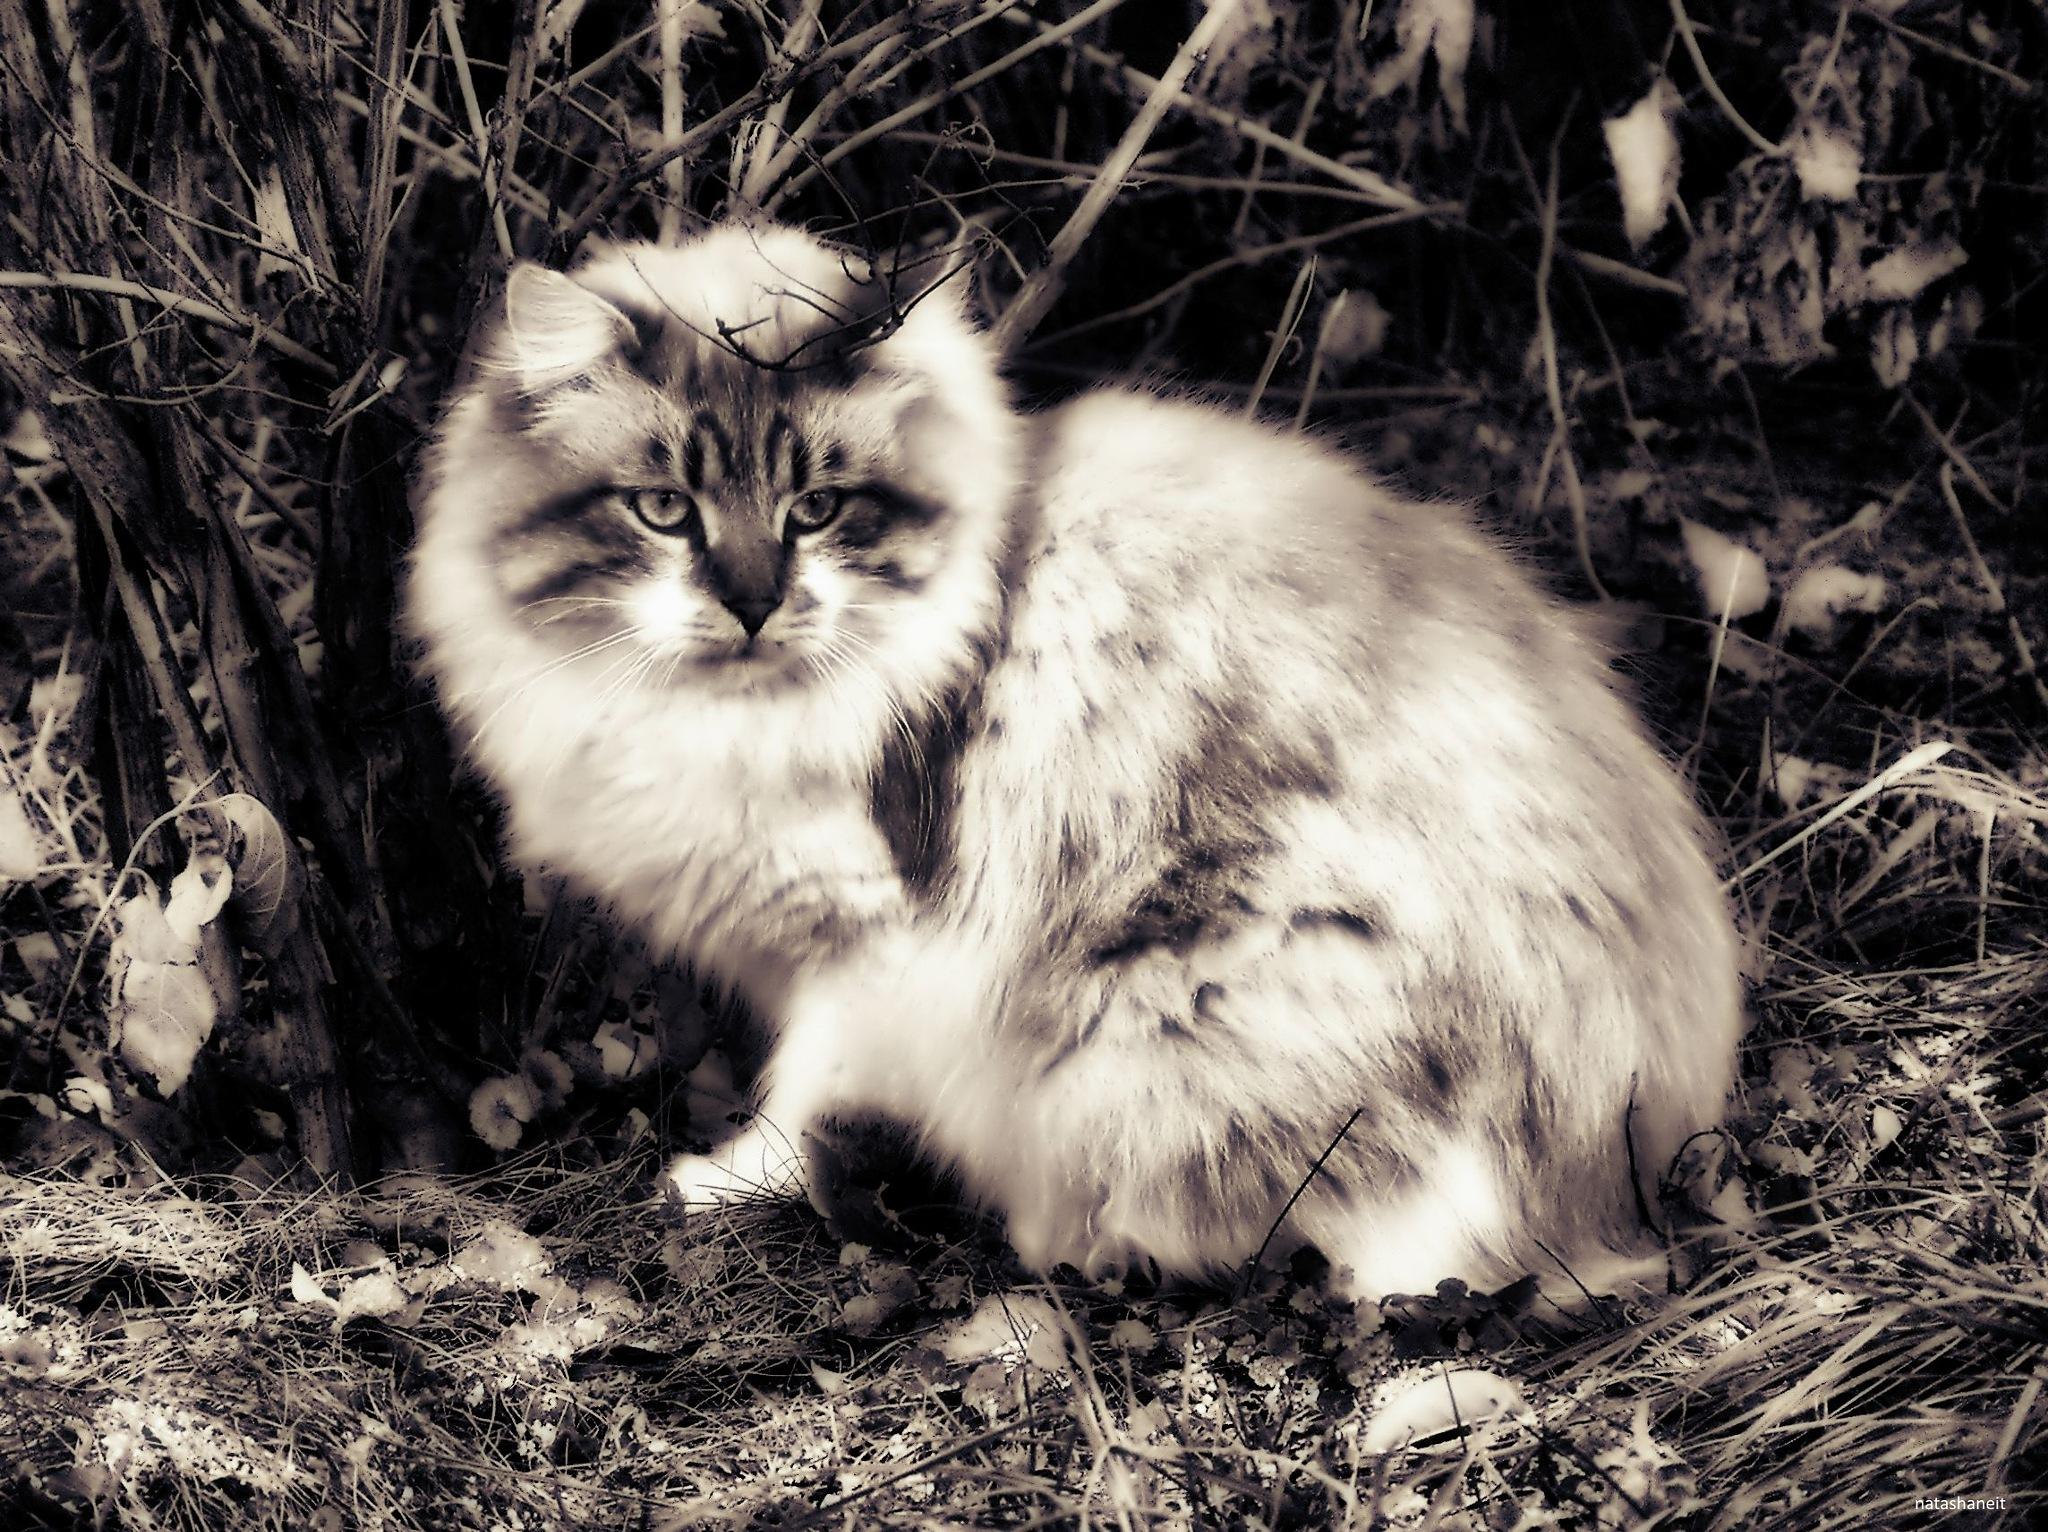 Cat on a walk by natashaneit